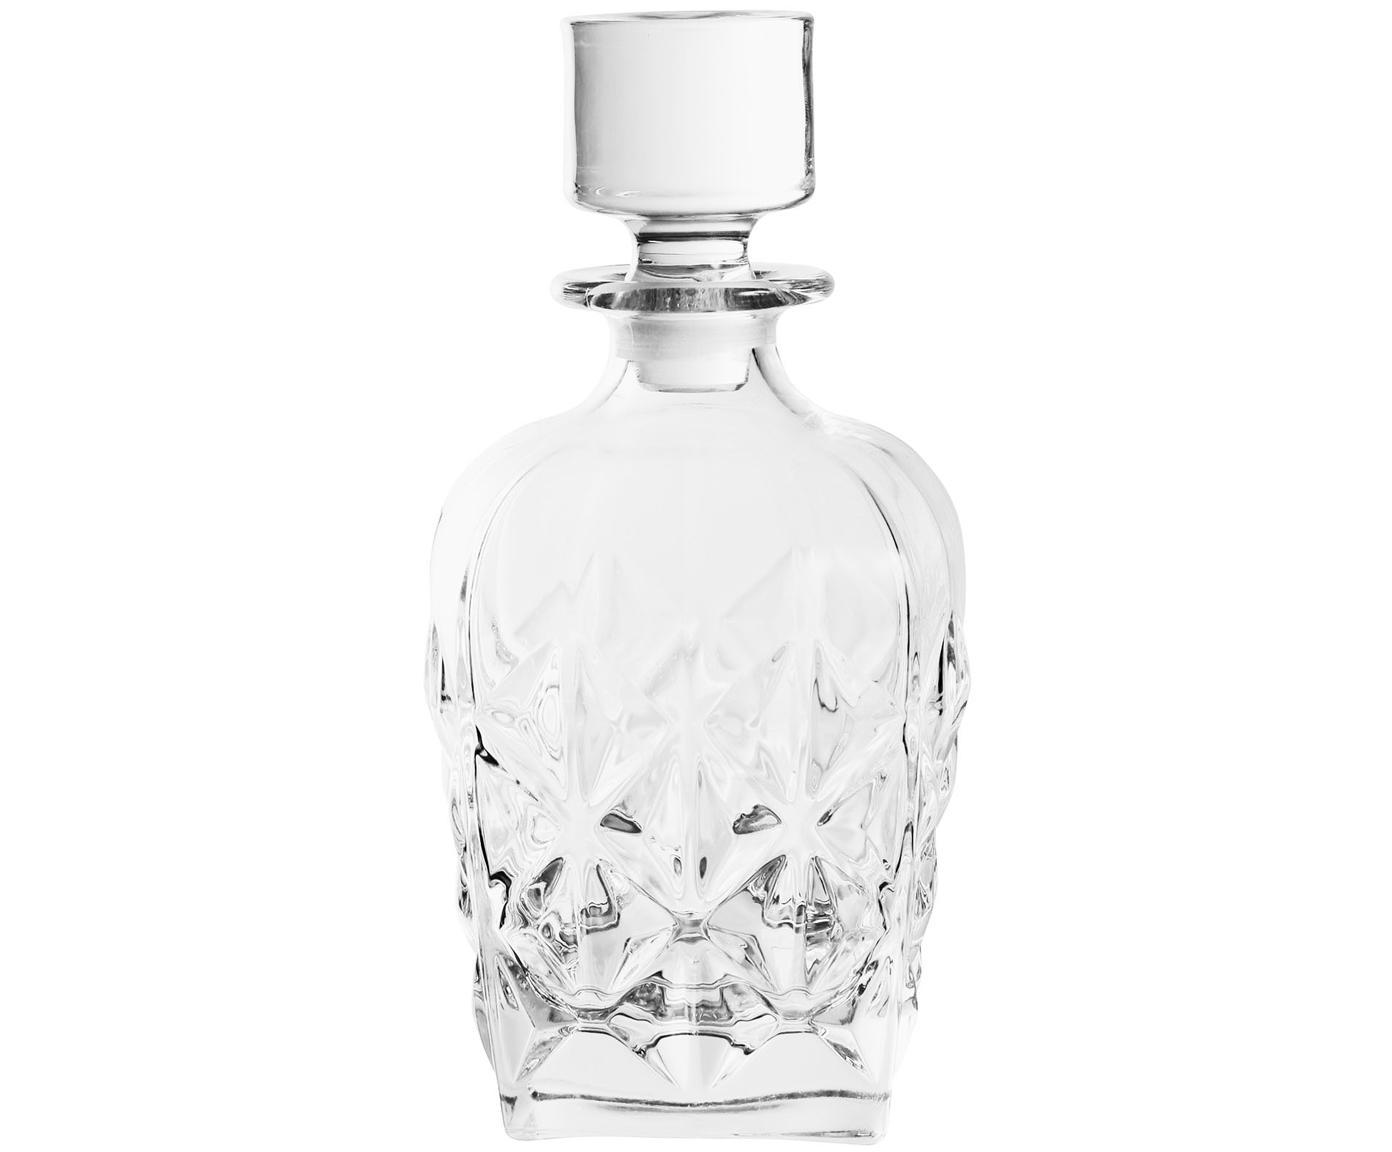 Decantador de cristal Fine, Cristal, Transparente, Al 17 cm